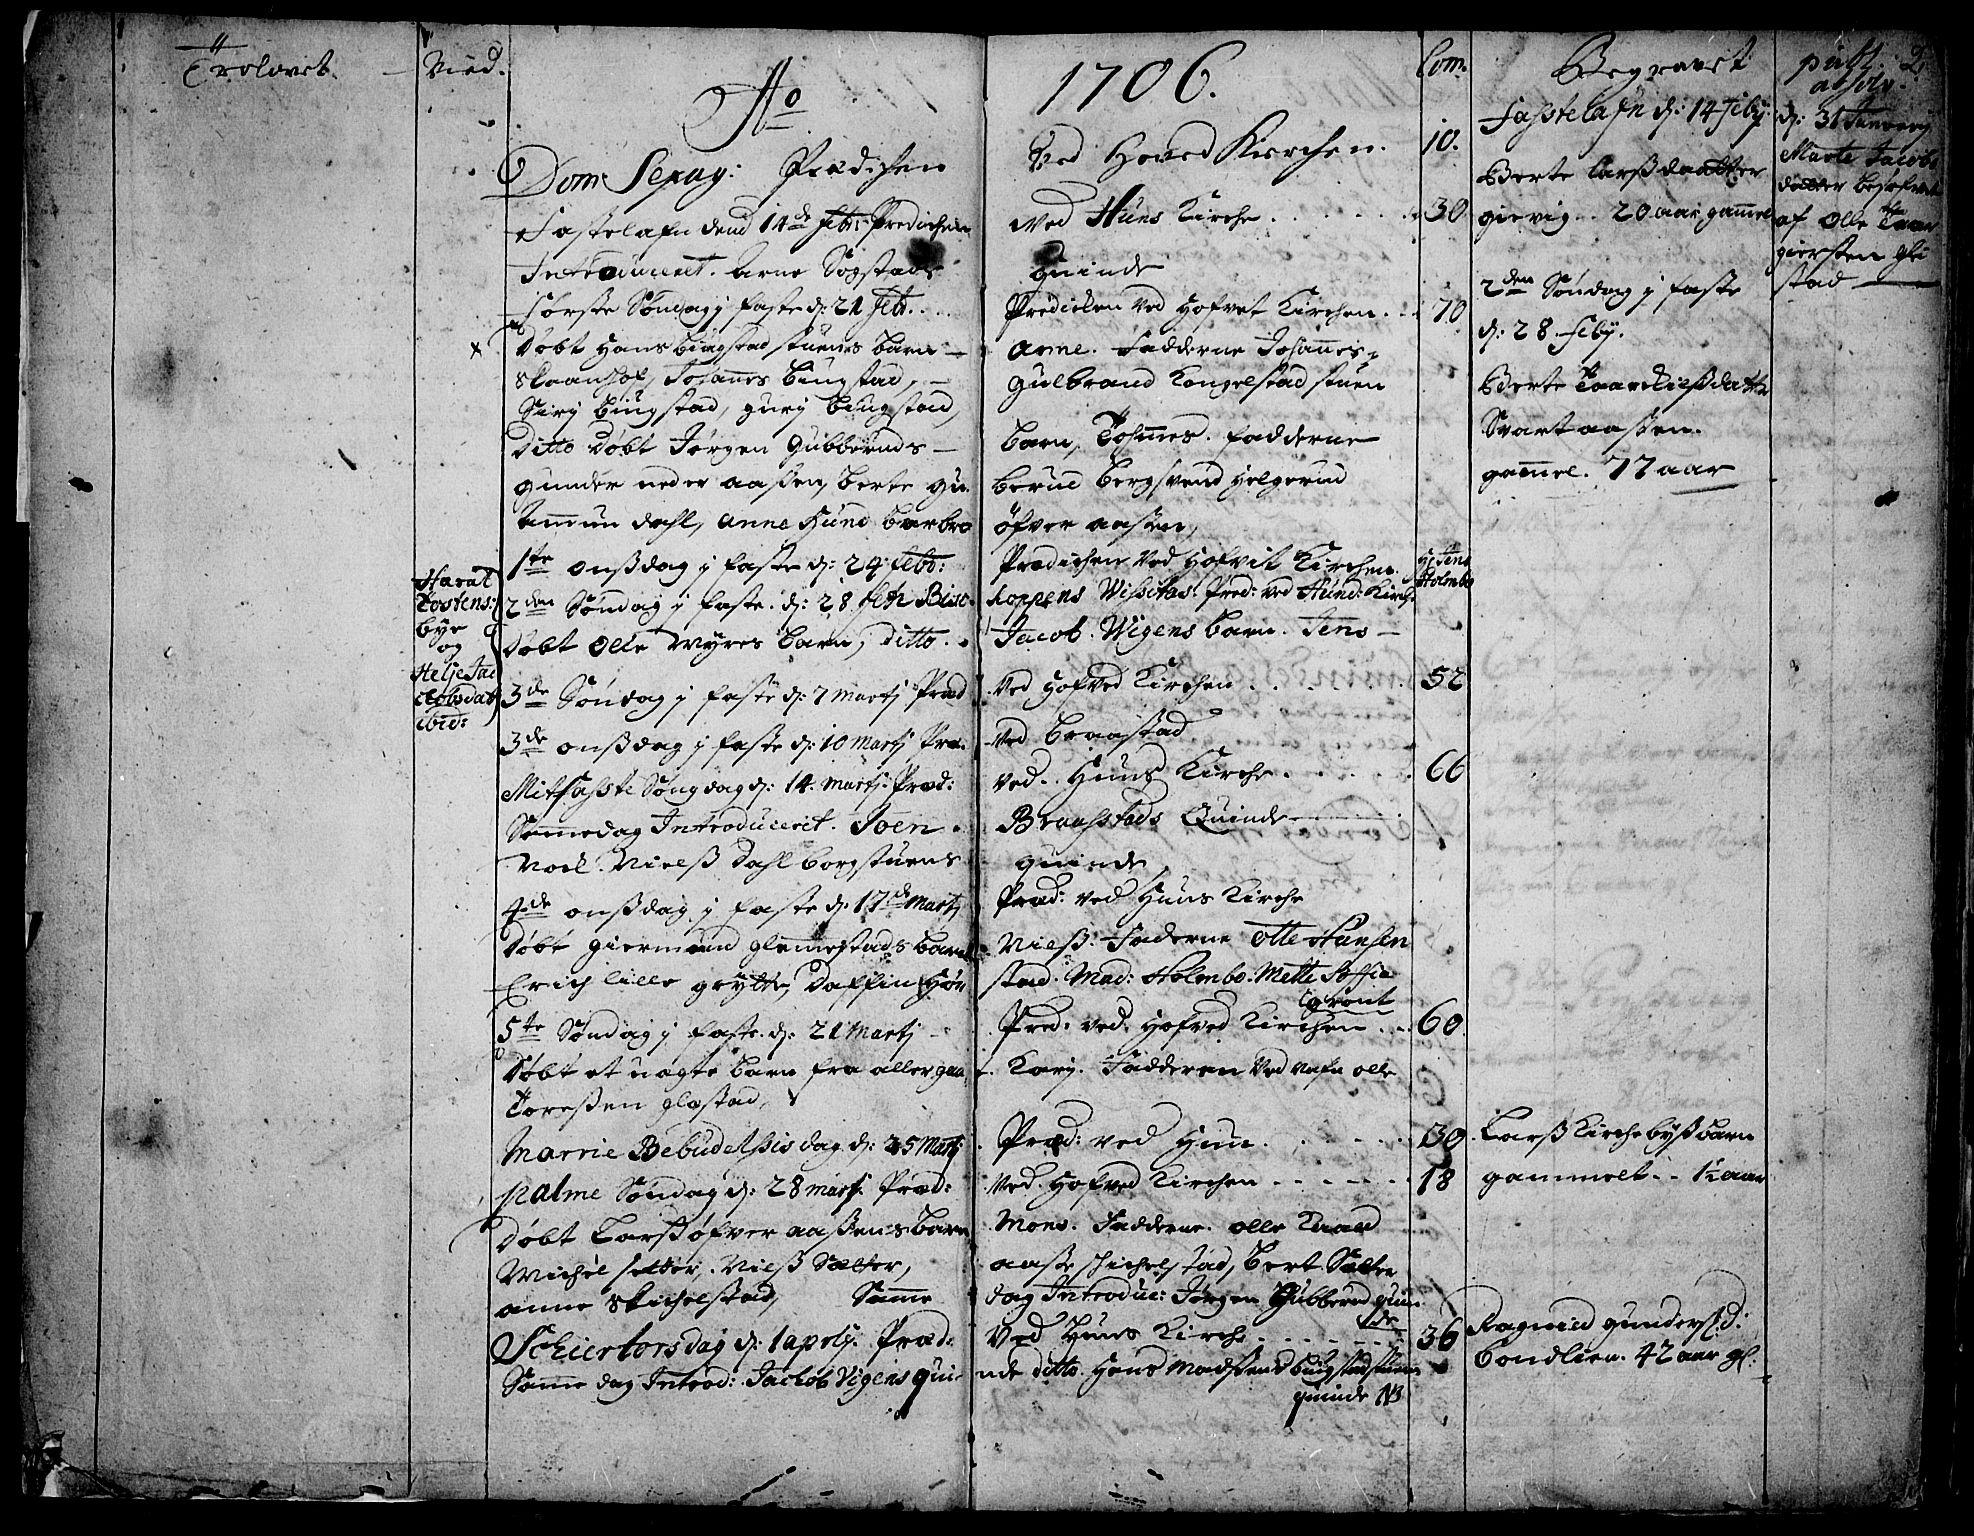 SAH, Vardal prestekontor, H/Ha/Haa/L0001: Ministerialbok nr. 1, 1706-1748, s. 2